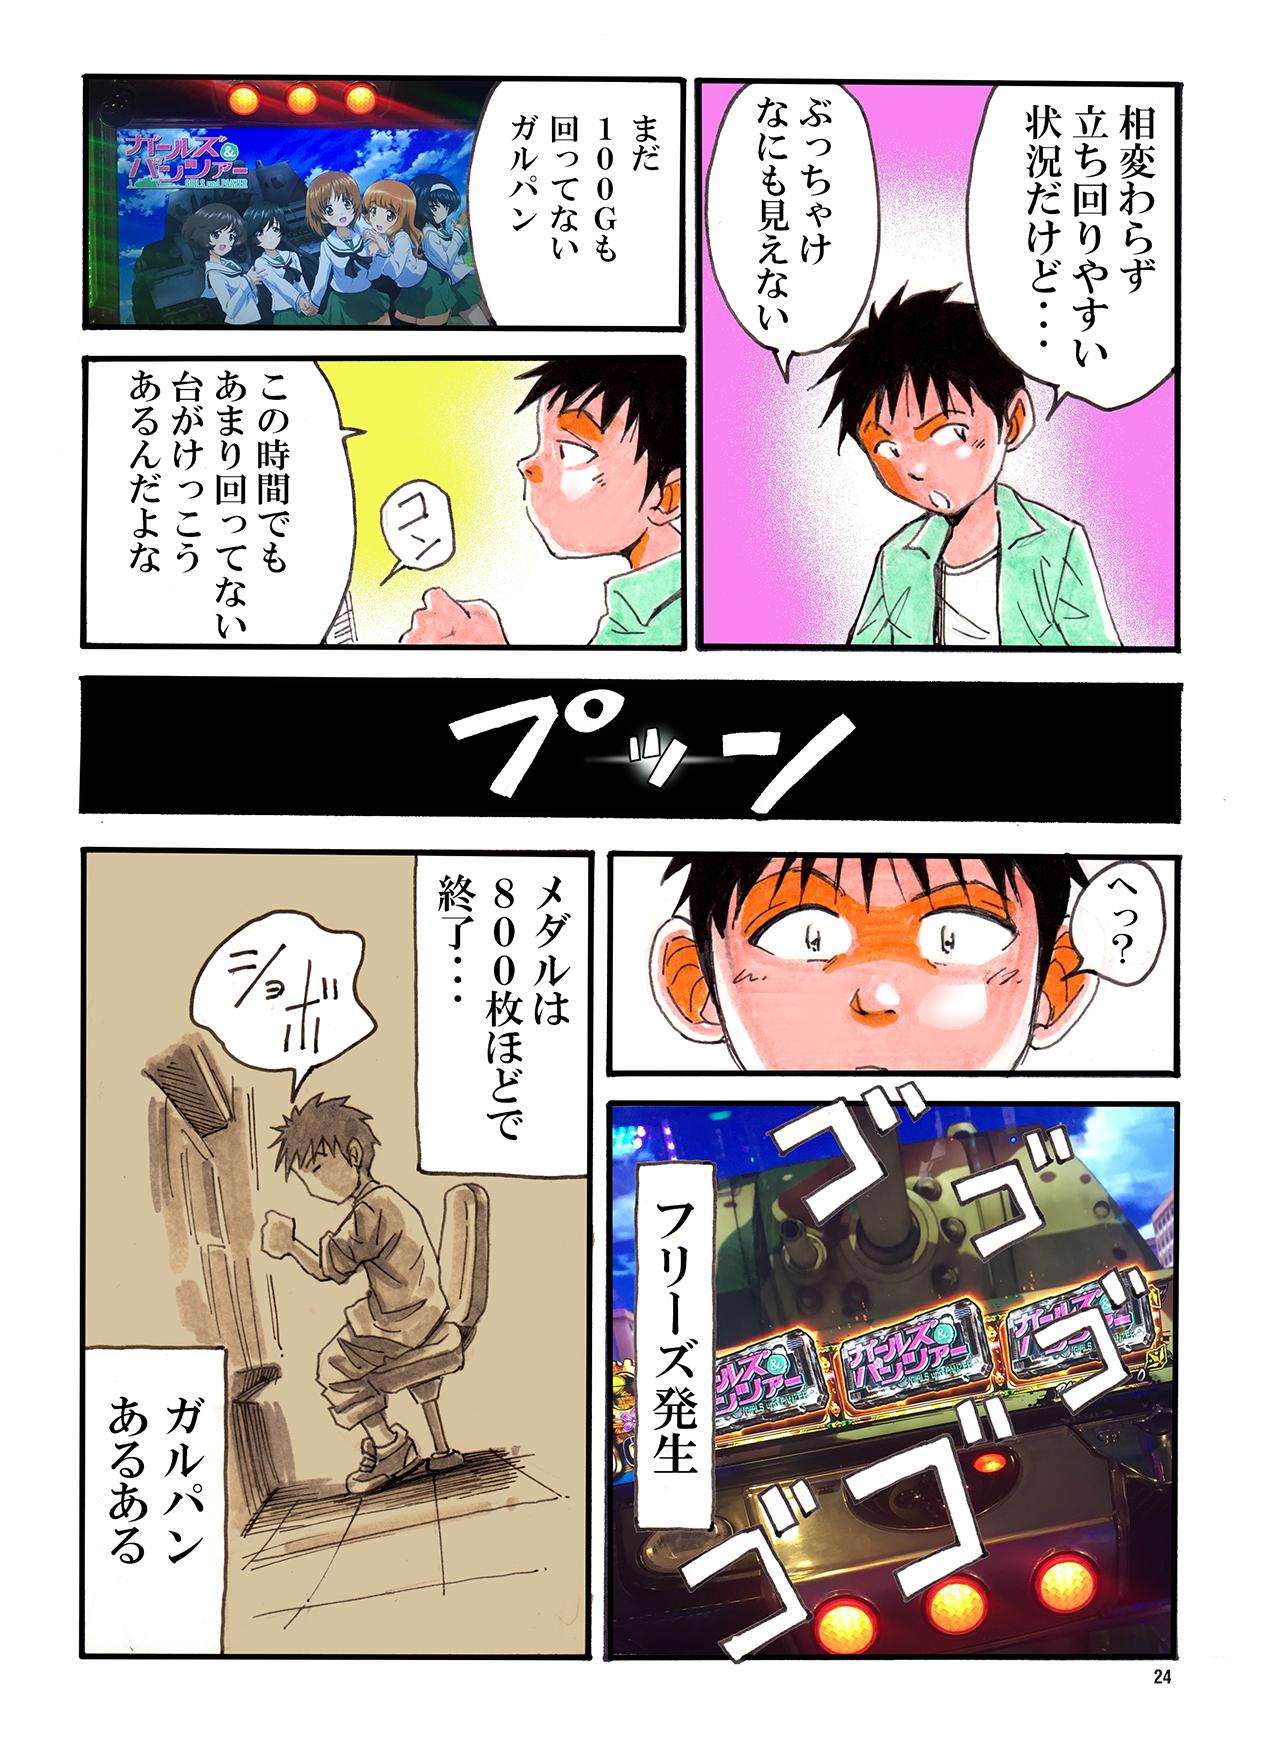 vol.4-4キング大解析